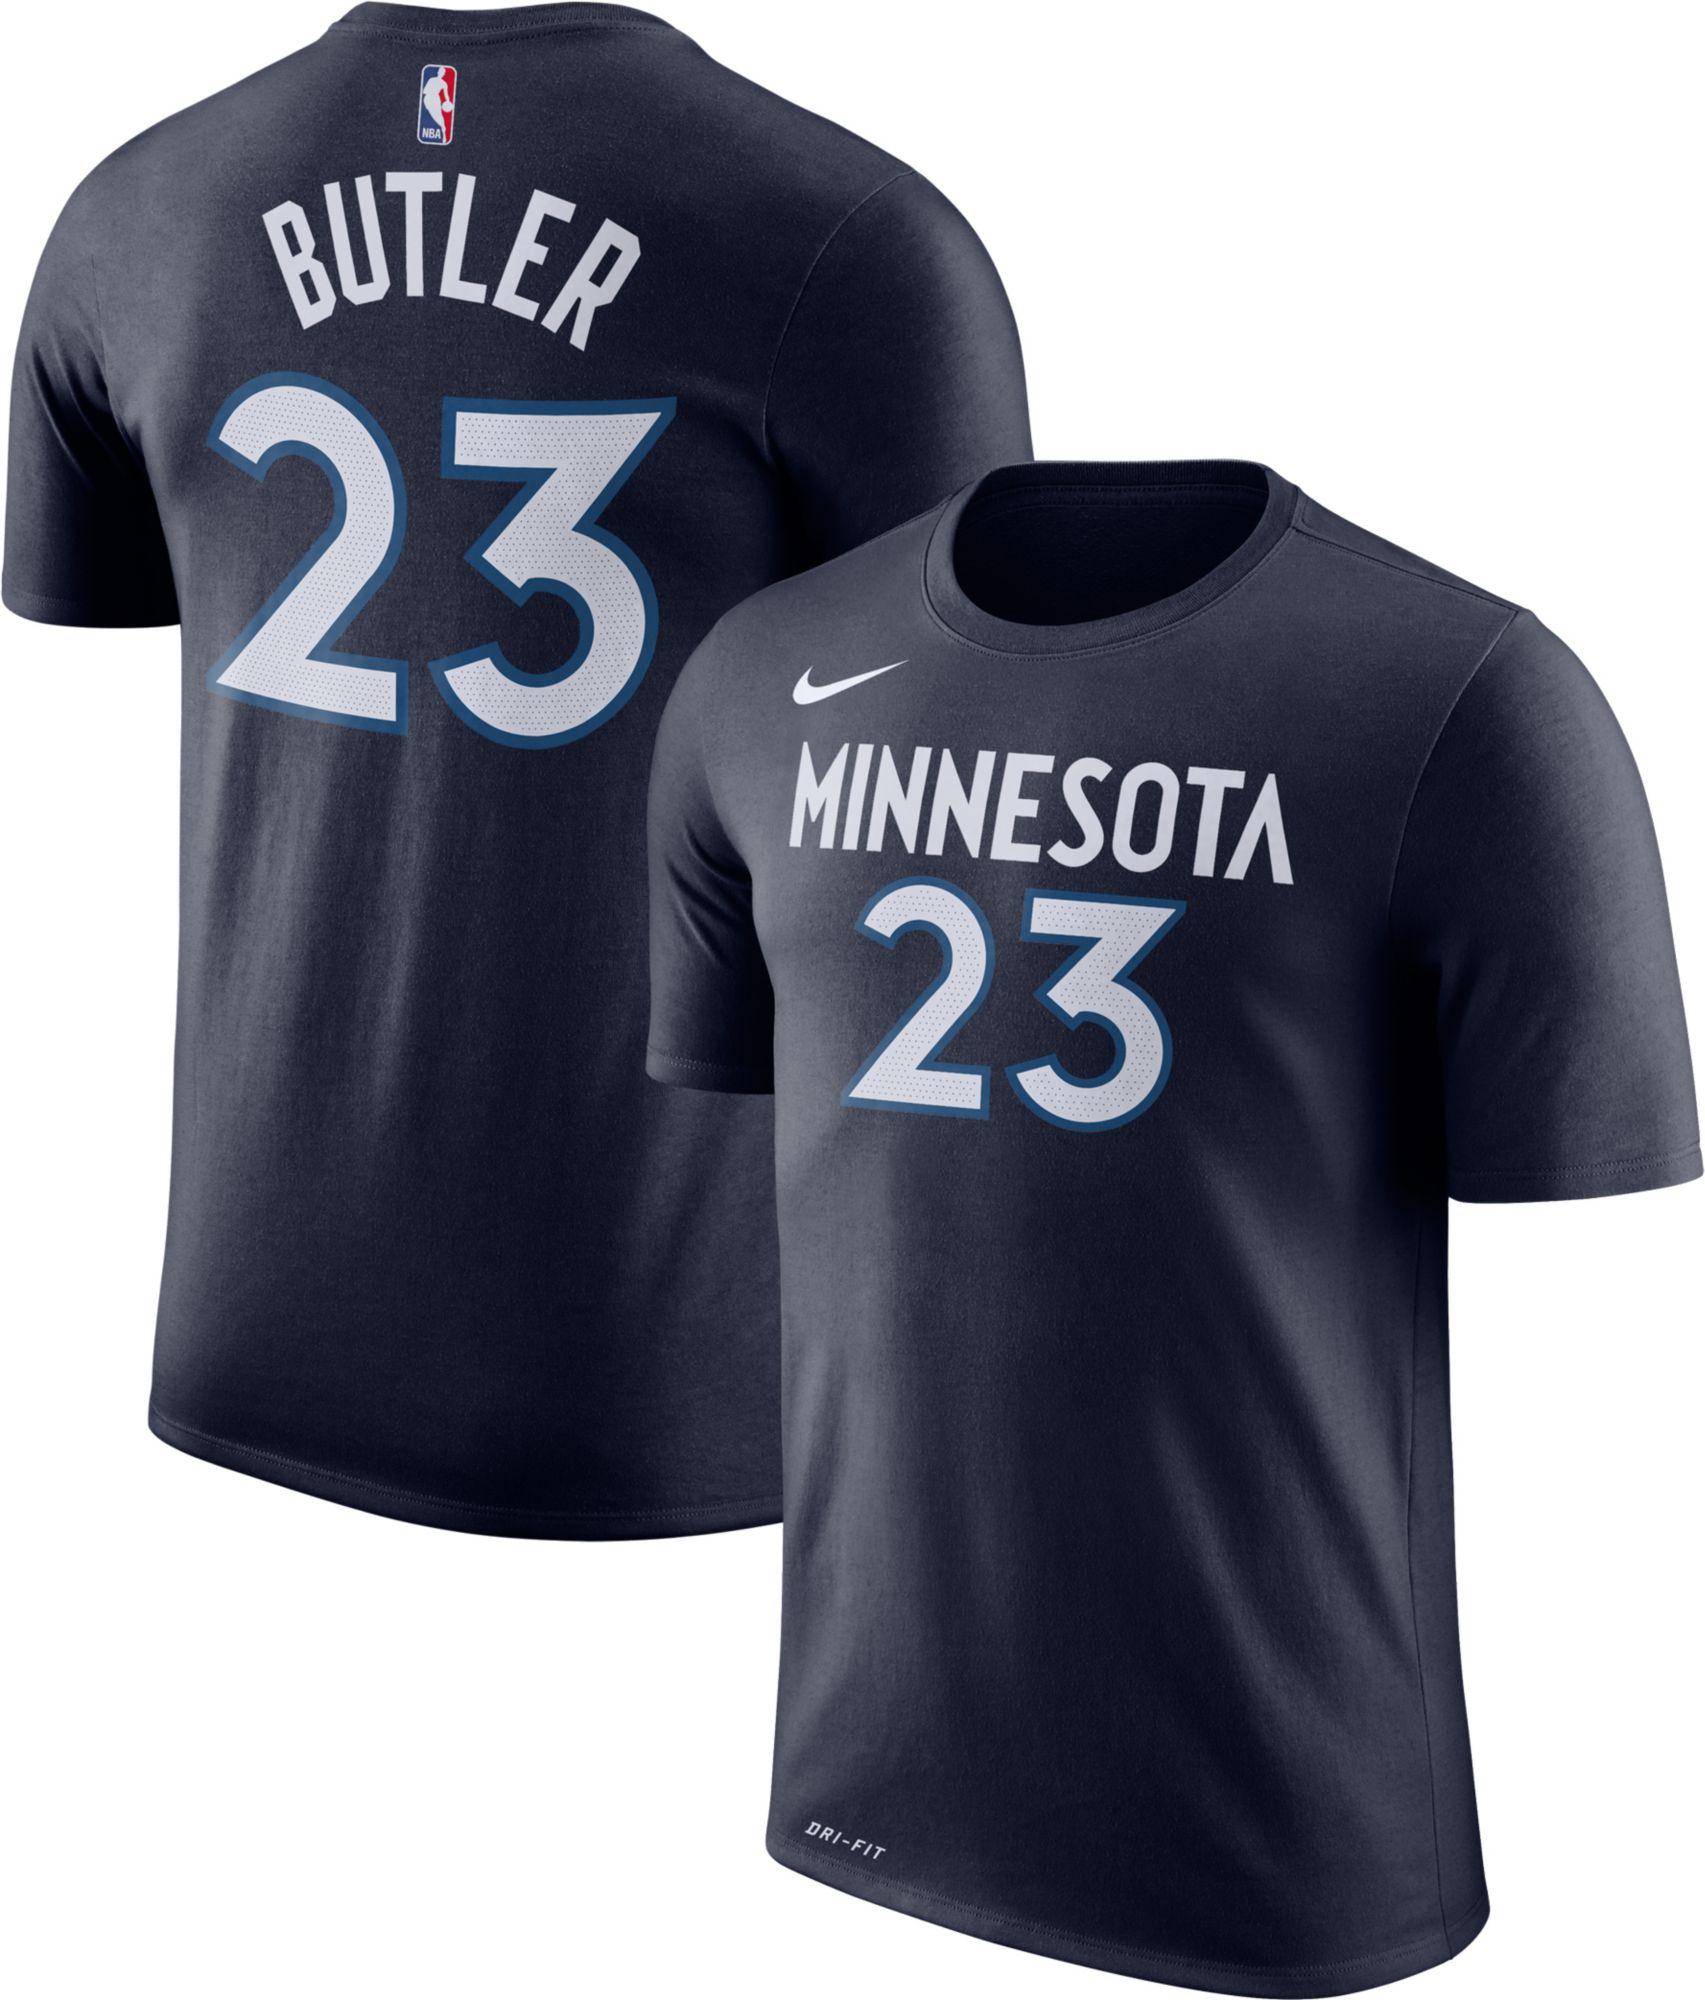 5bb2f92aa419 ... italy nike youth minnesota timberwolves jimmy butler 23 dri fit navy t  shirt 536c9 f6ddb